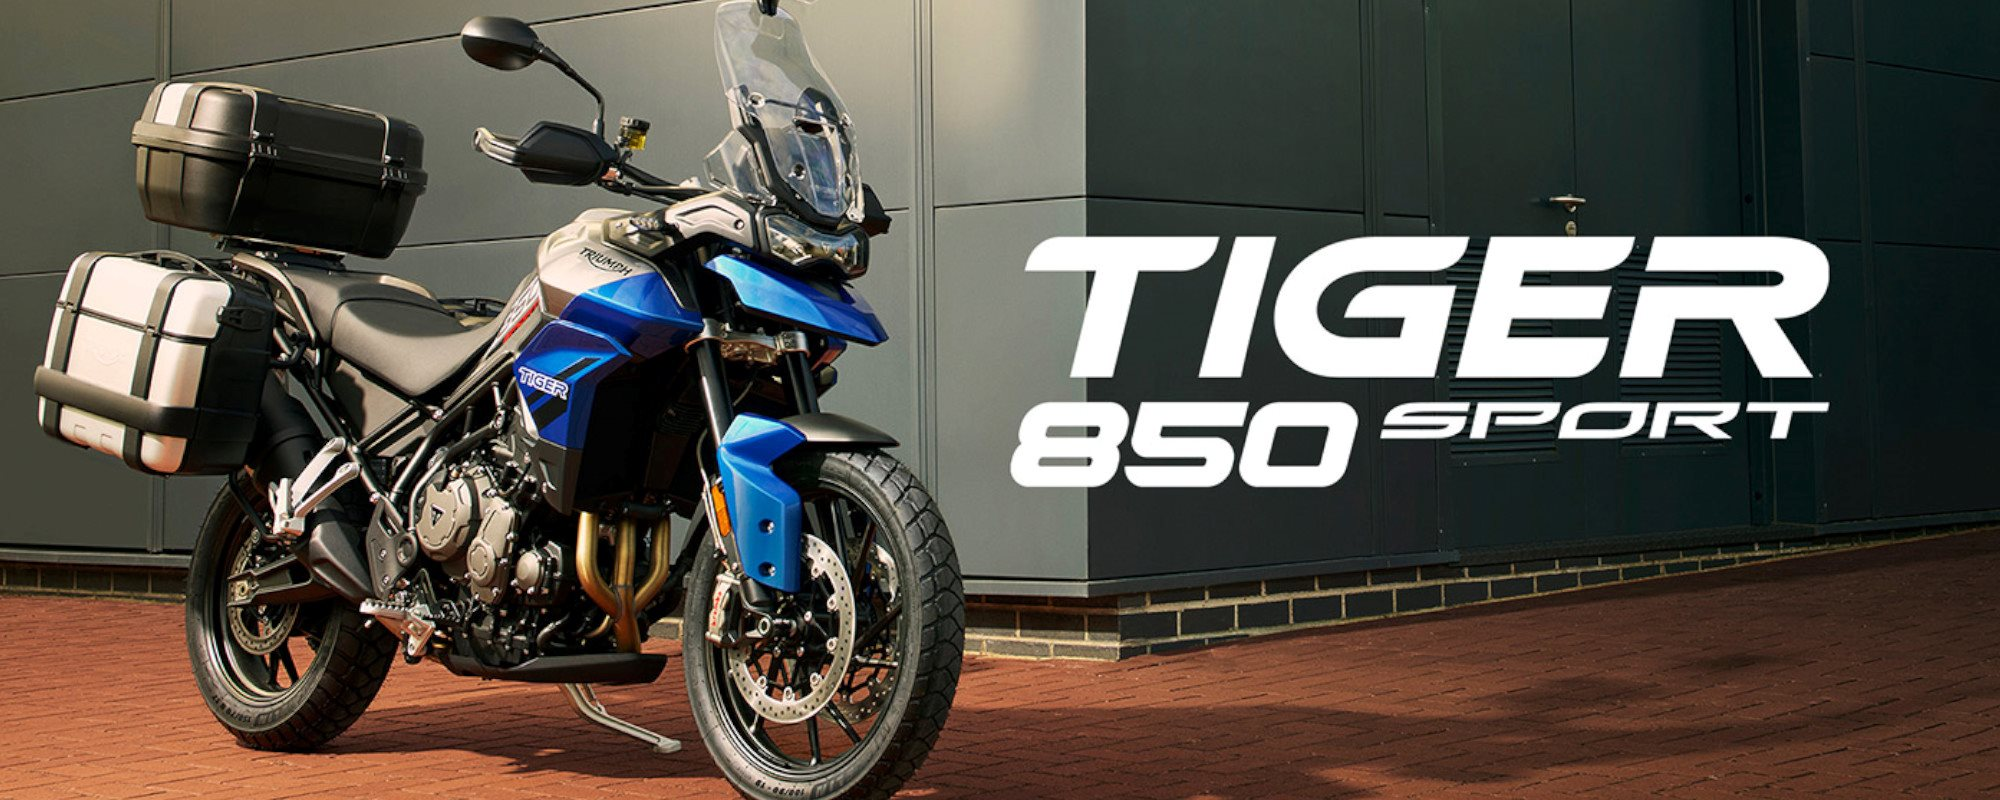 TIGER 850 SPORT